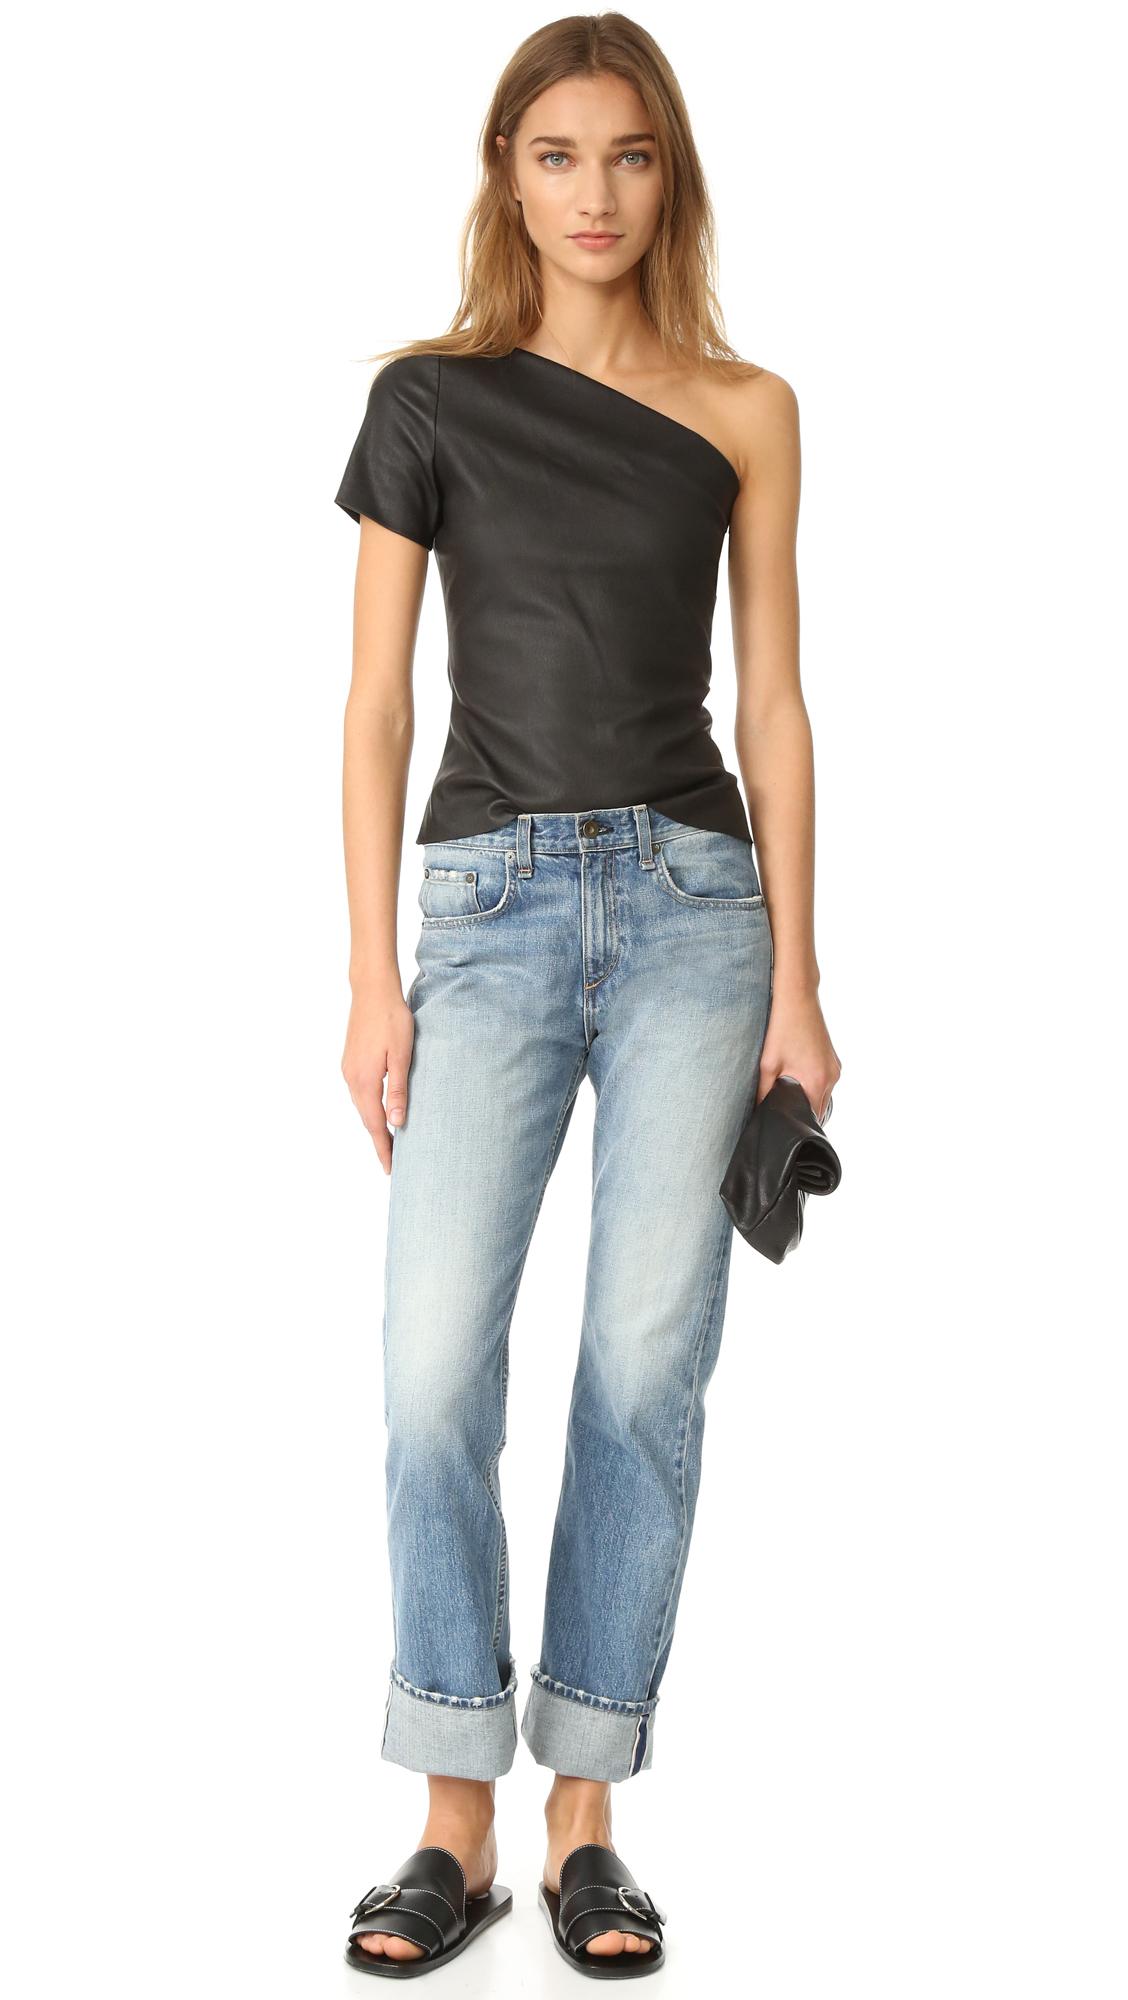 9d3f762eff7 Helmut Lang Asymmetrical One Shoulder Leather Top | SHOPBOP